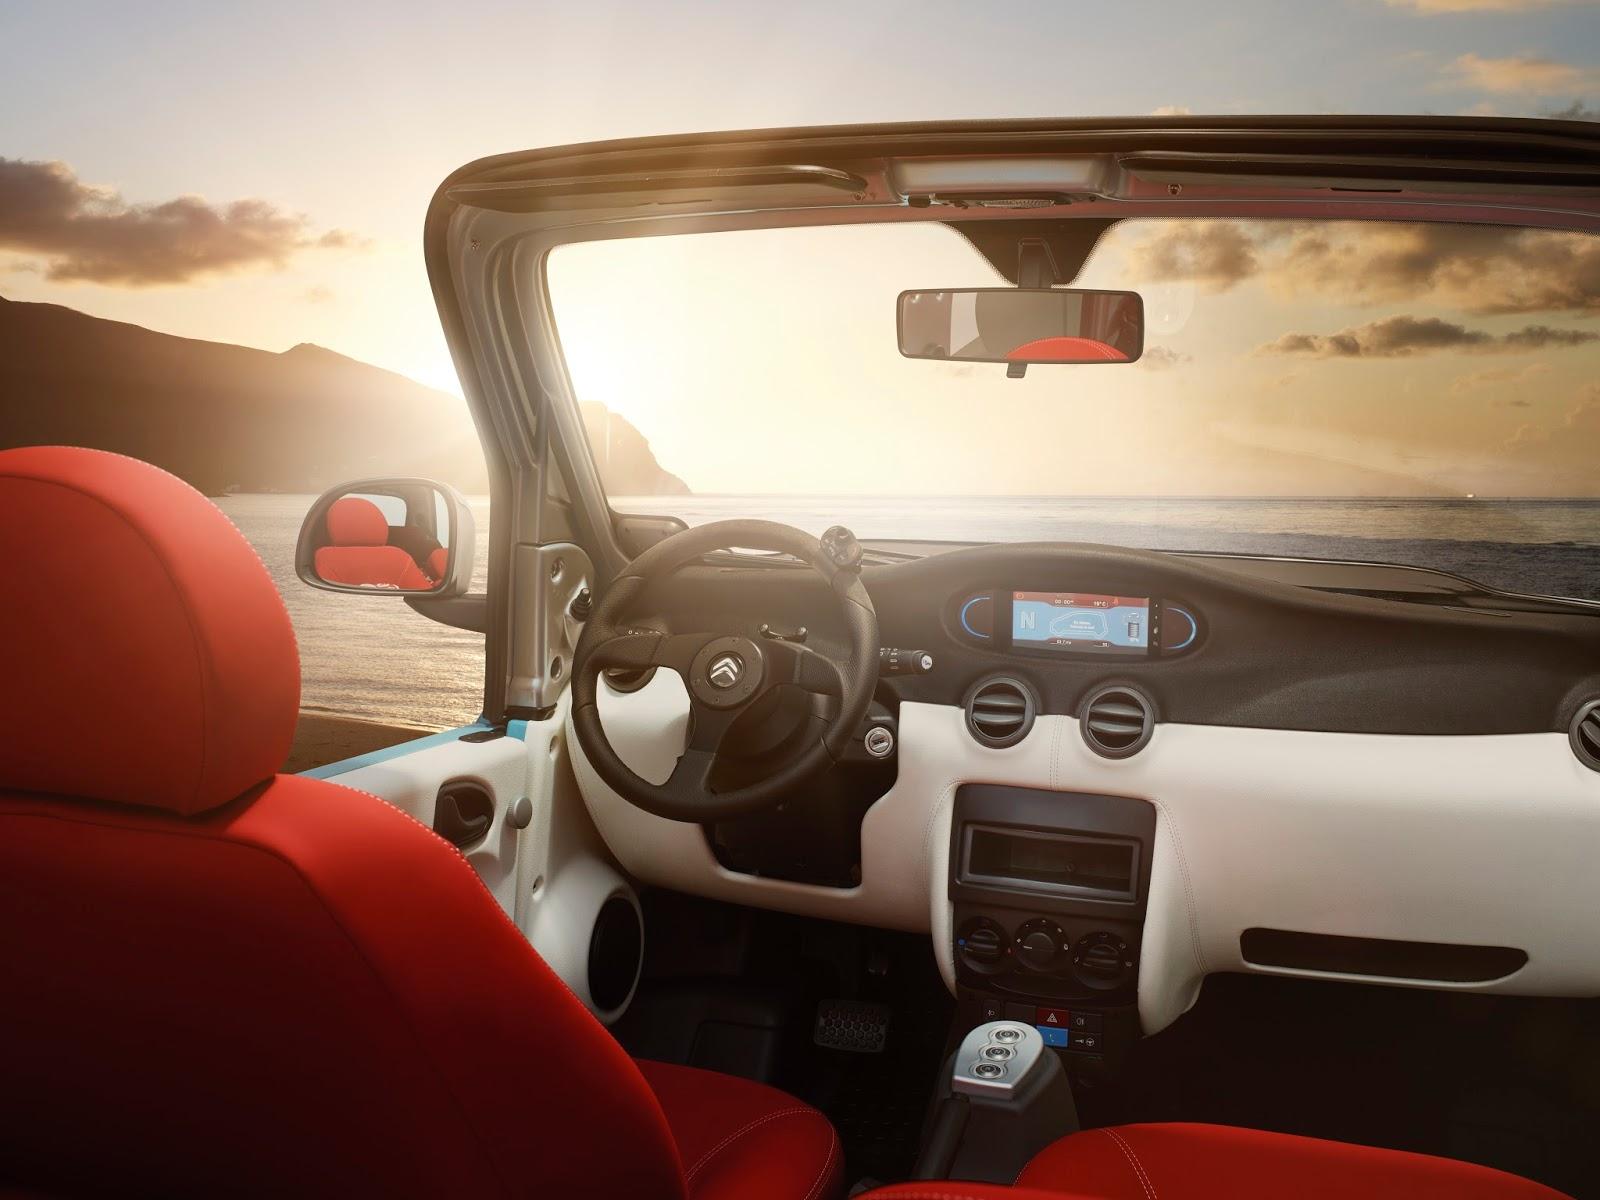 CL%2B16.005.006 Με 5 Παγκόσμιες Πρεμιέρες η Citroën Στο Σαλόνι Αυτοκινήτου της Γενεύης